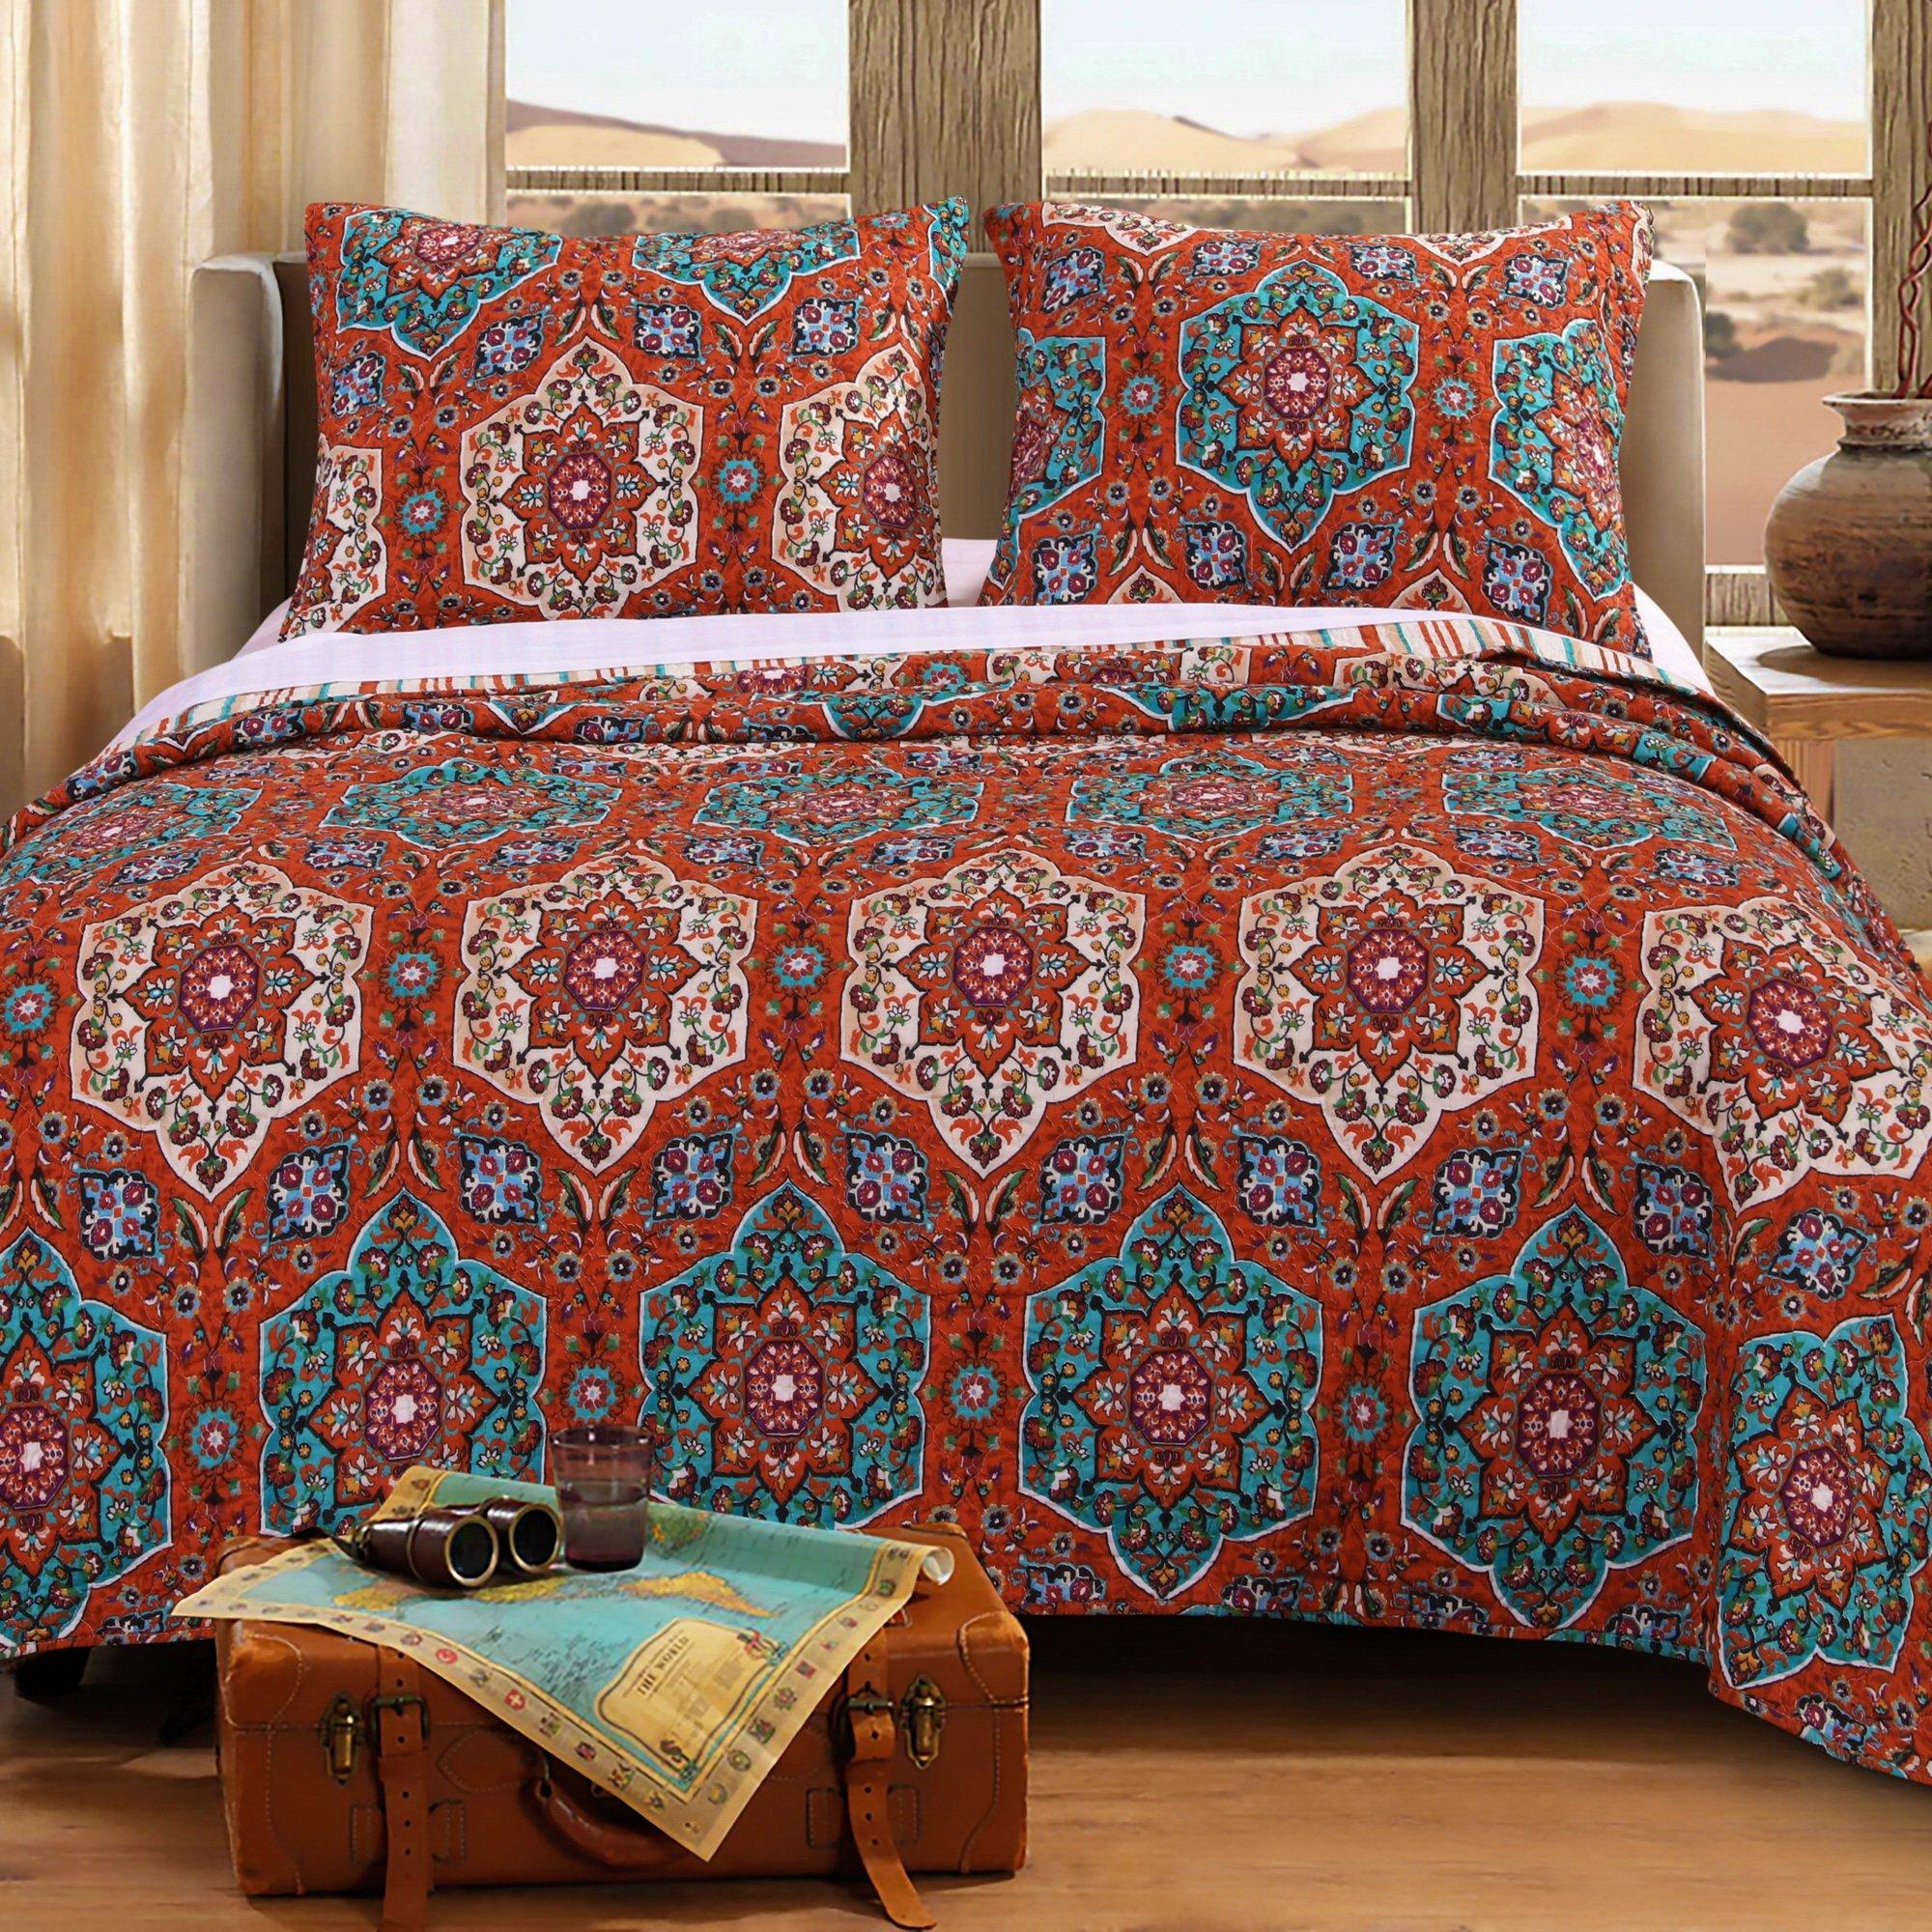 Quilt Set with Shams 3 Piece Bohemian Boho Chic Geometric Medallion Mandala Floral Design Blue Orange Neutral Bedding Luxury Reversible Bedspread Oversized King/Cal King - Includes Bed Sheet Straps